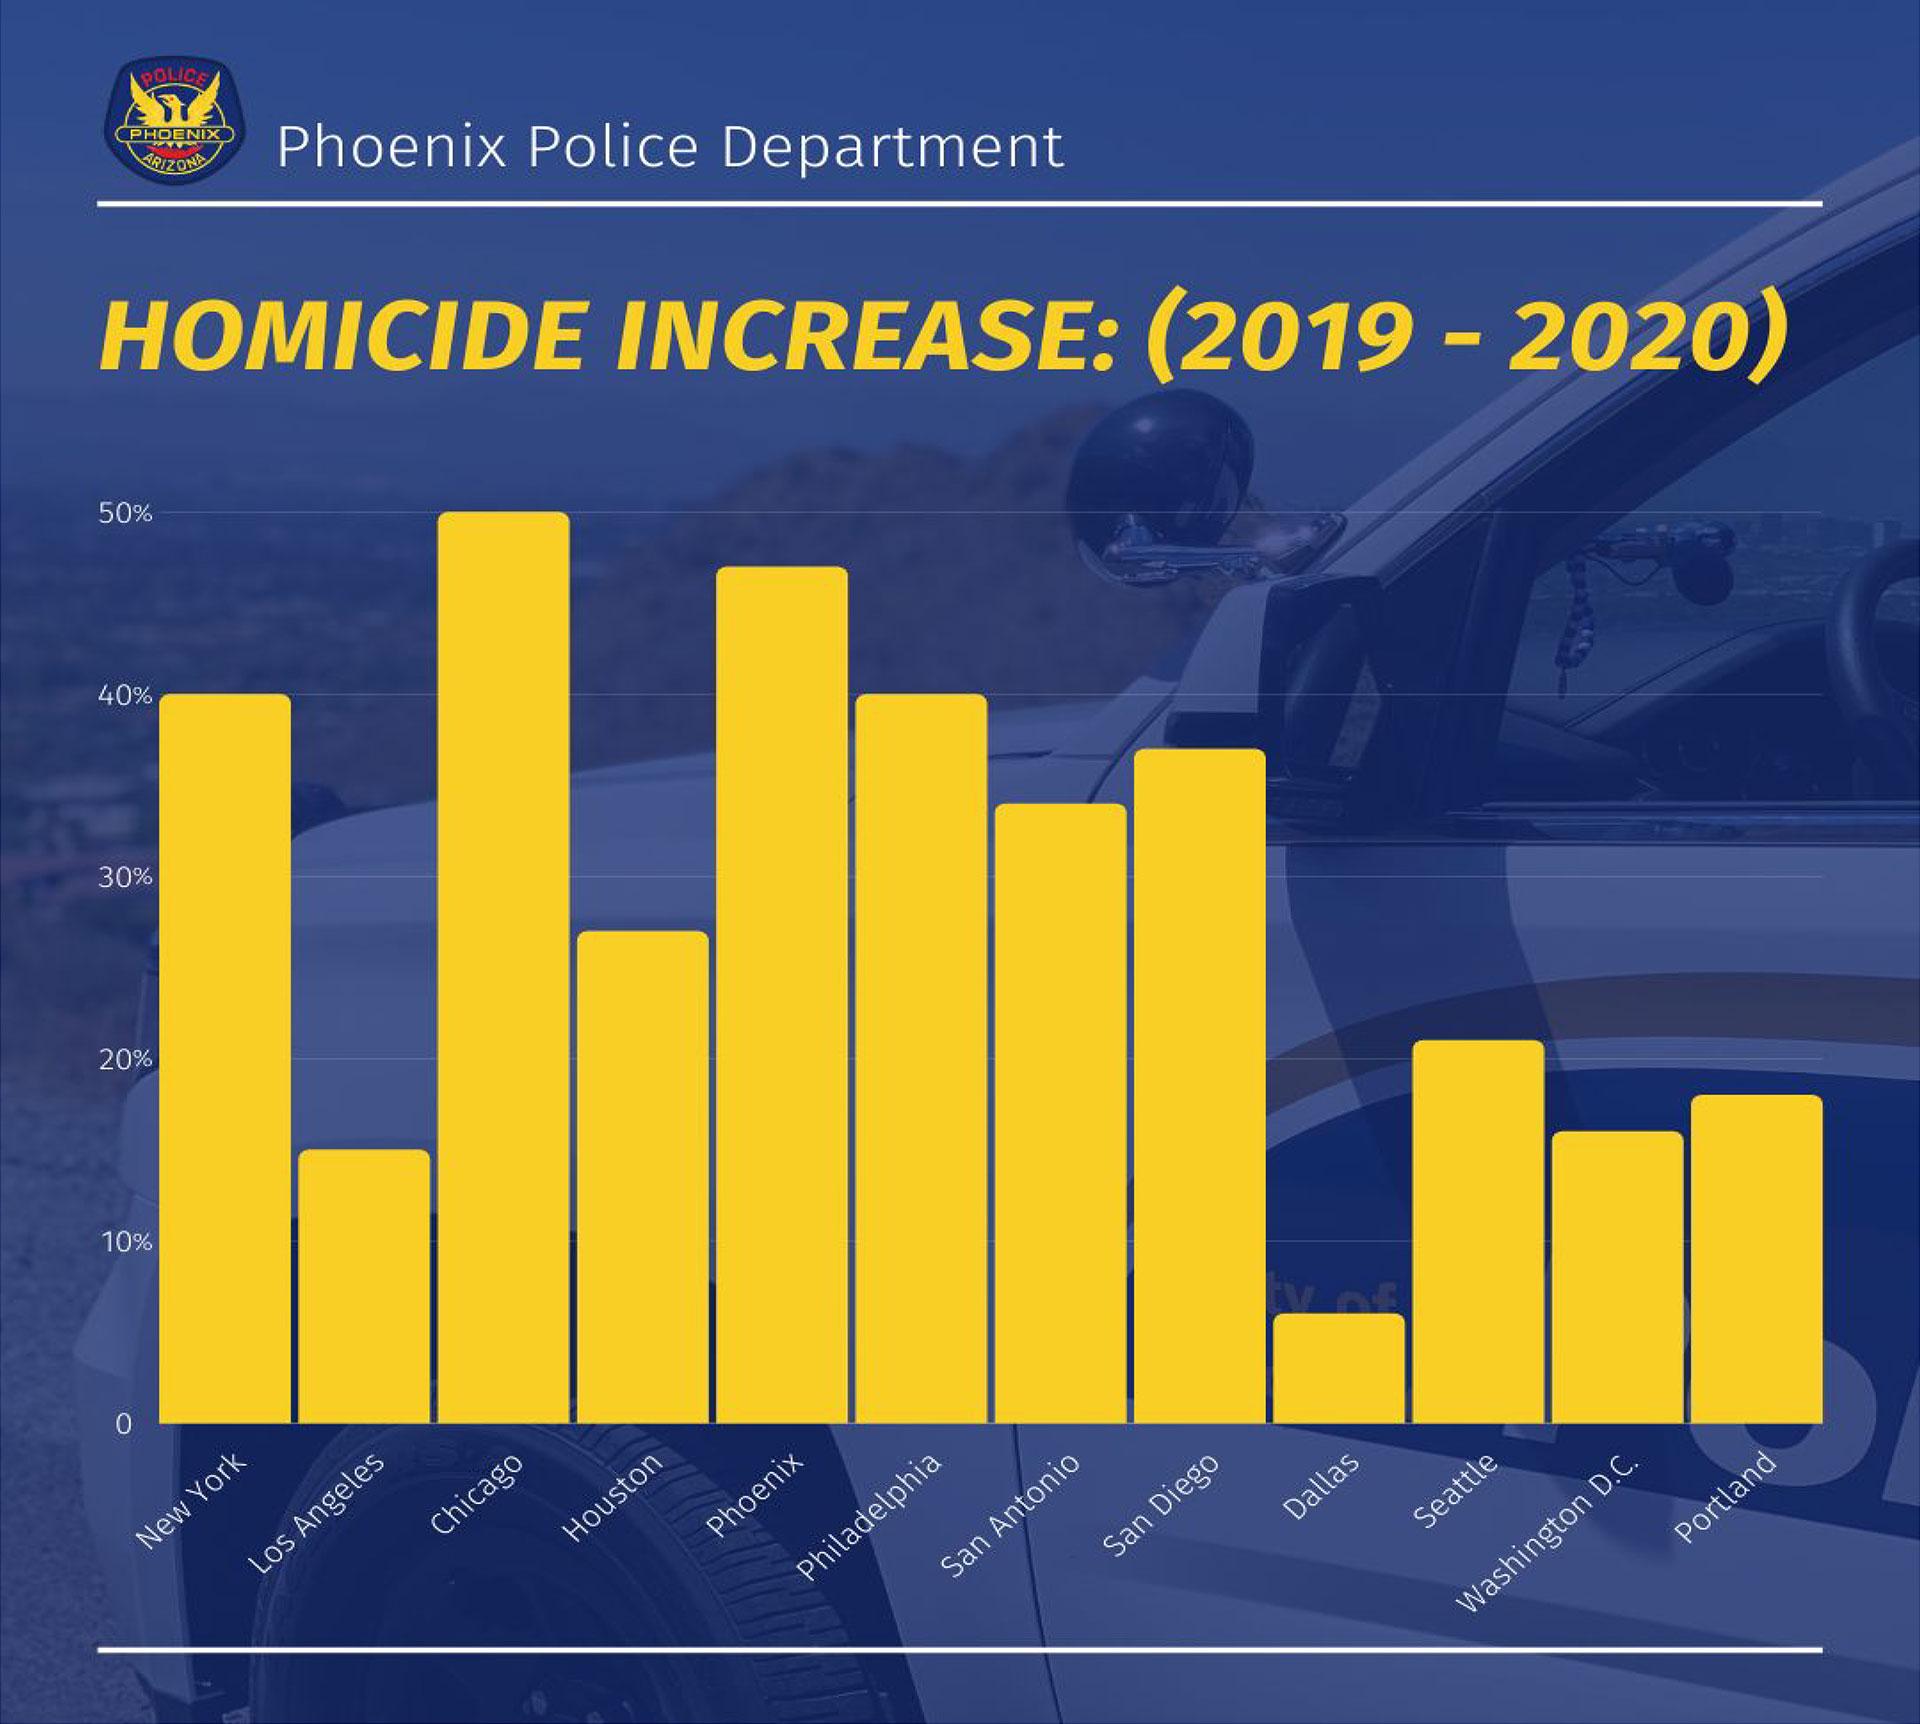 2020 Homicide Increase